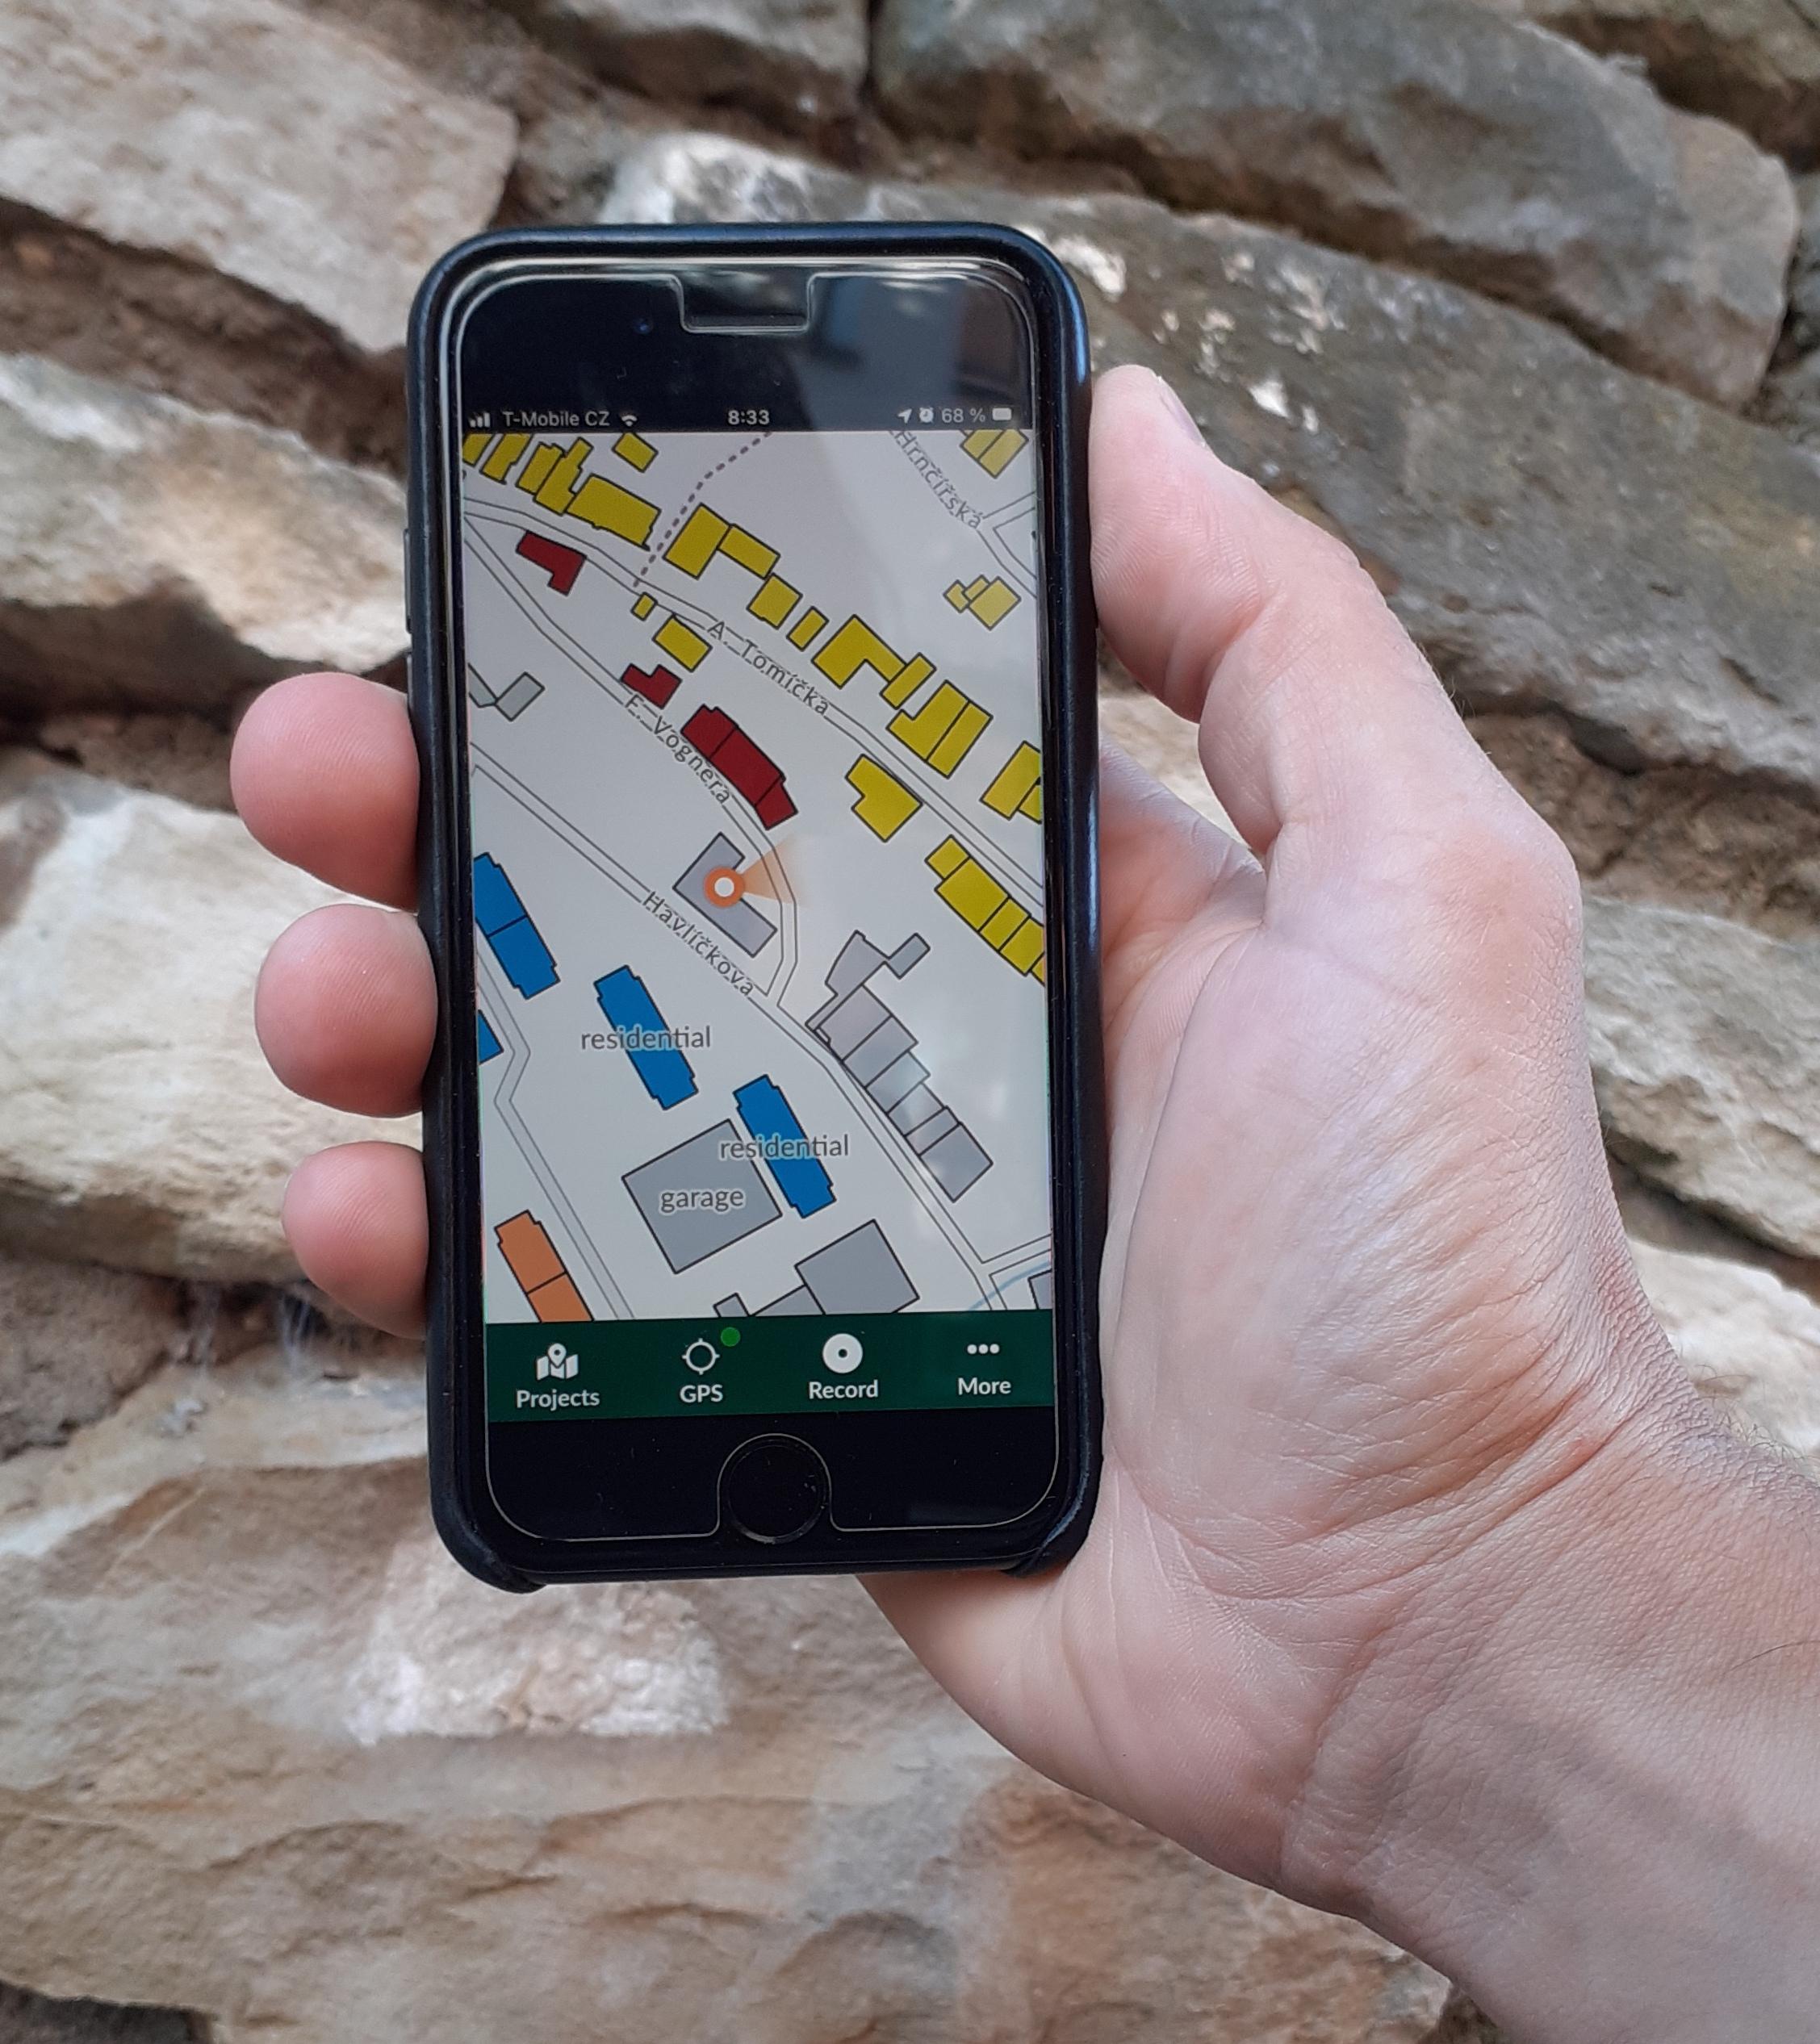 qgis map © OpenStreetMap contributors